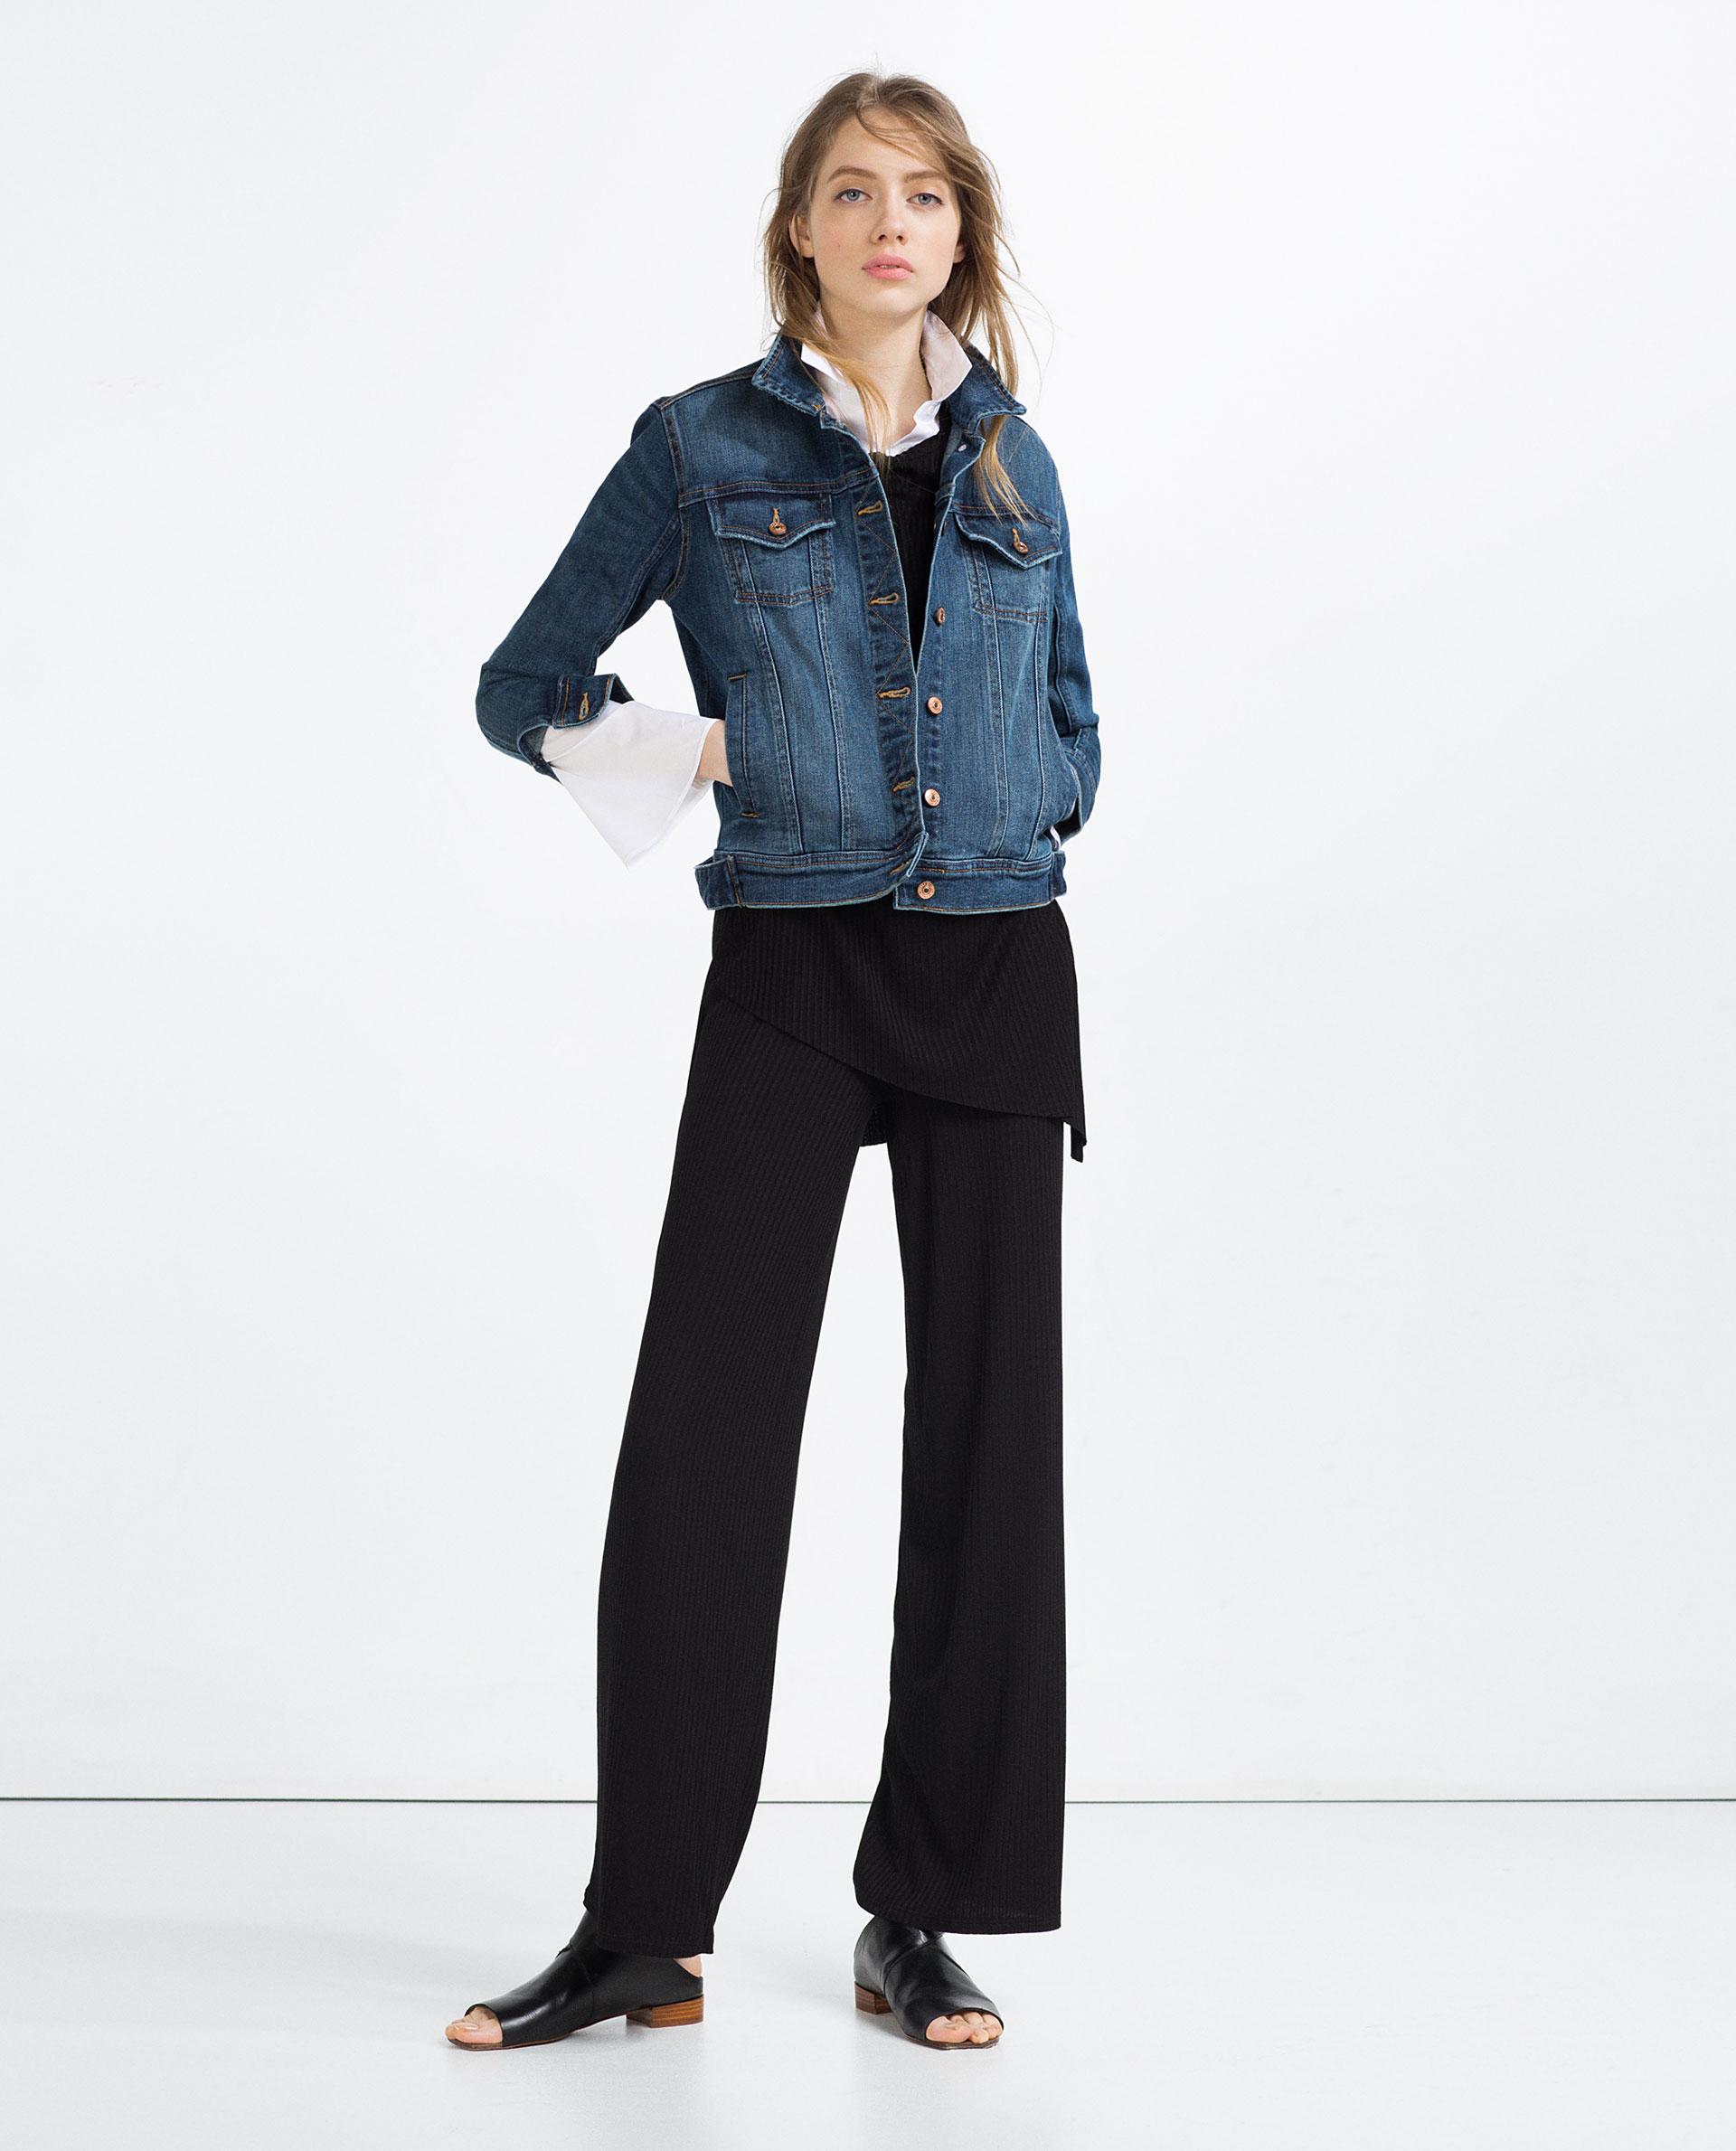 Blue Denim Jacket Mens - Fashion Ideas